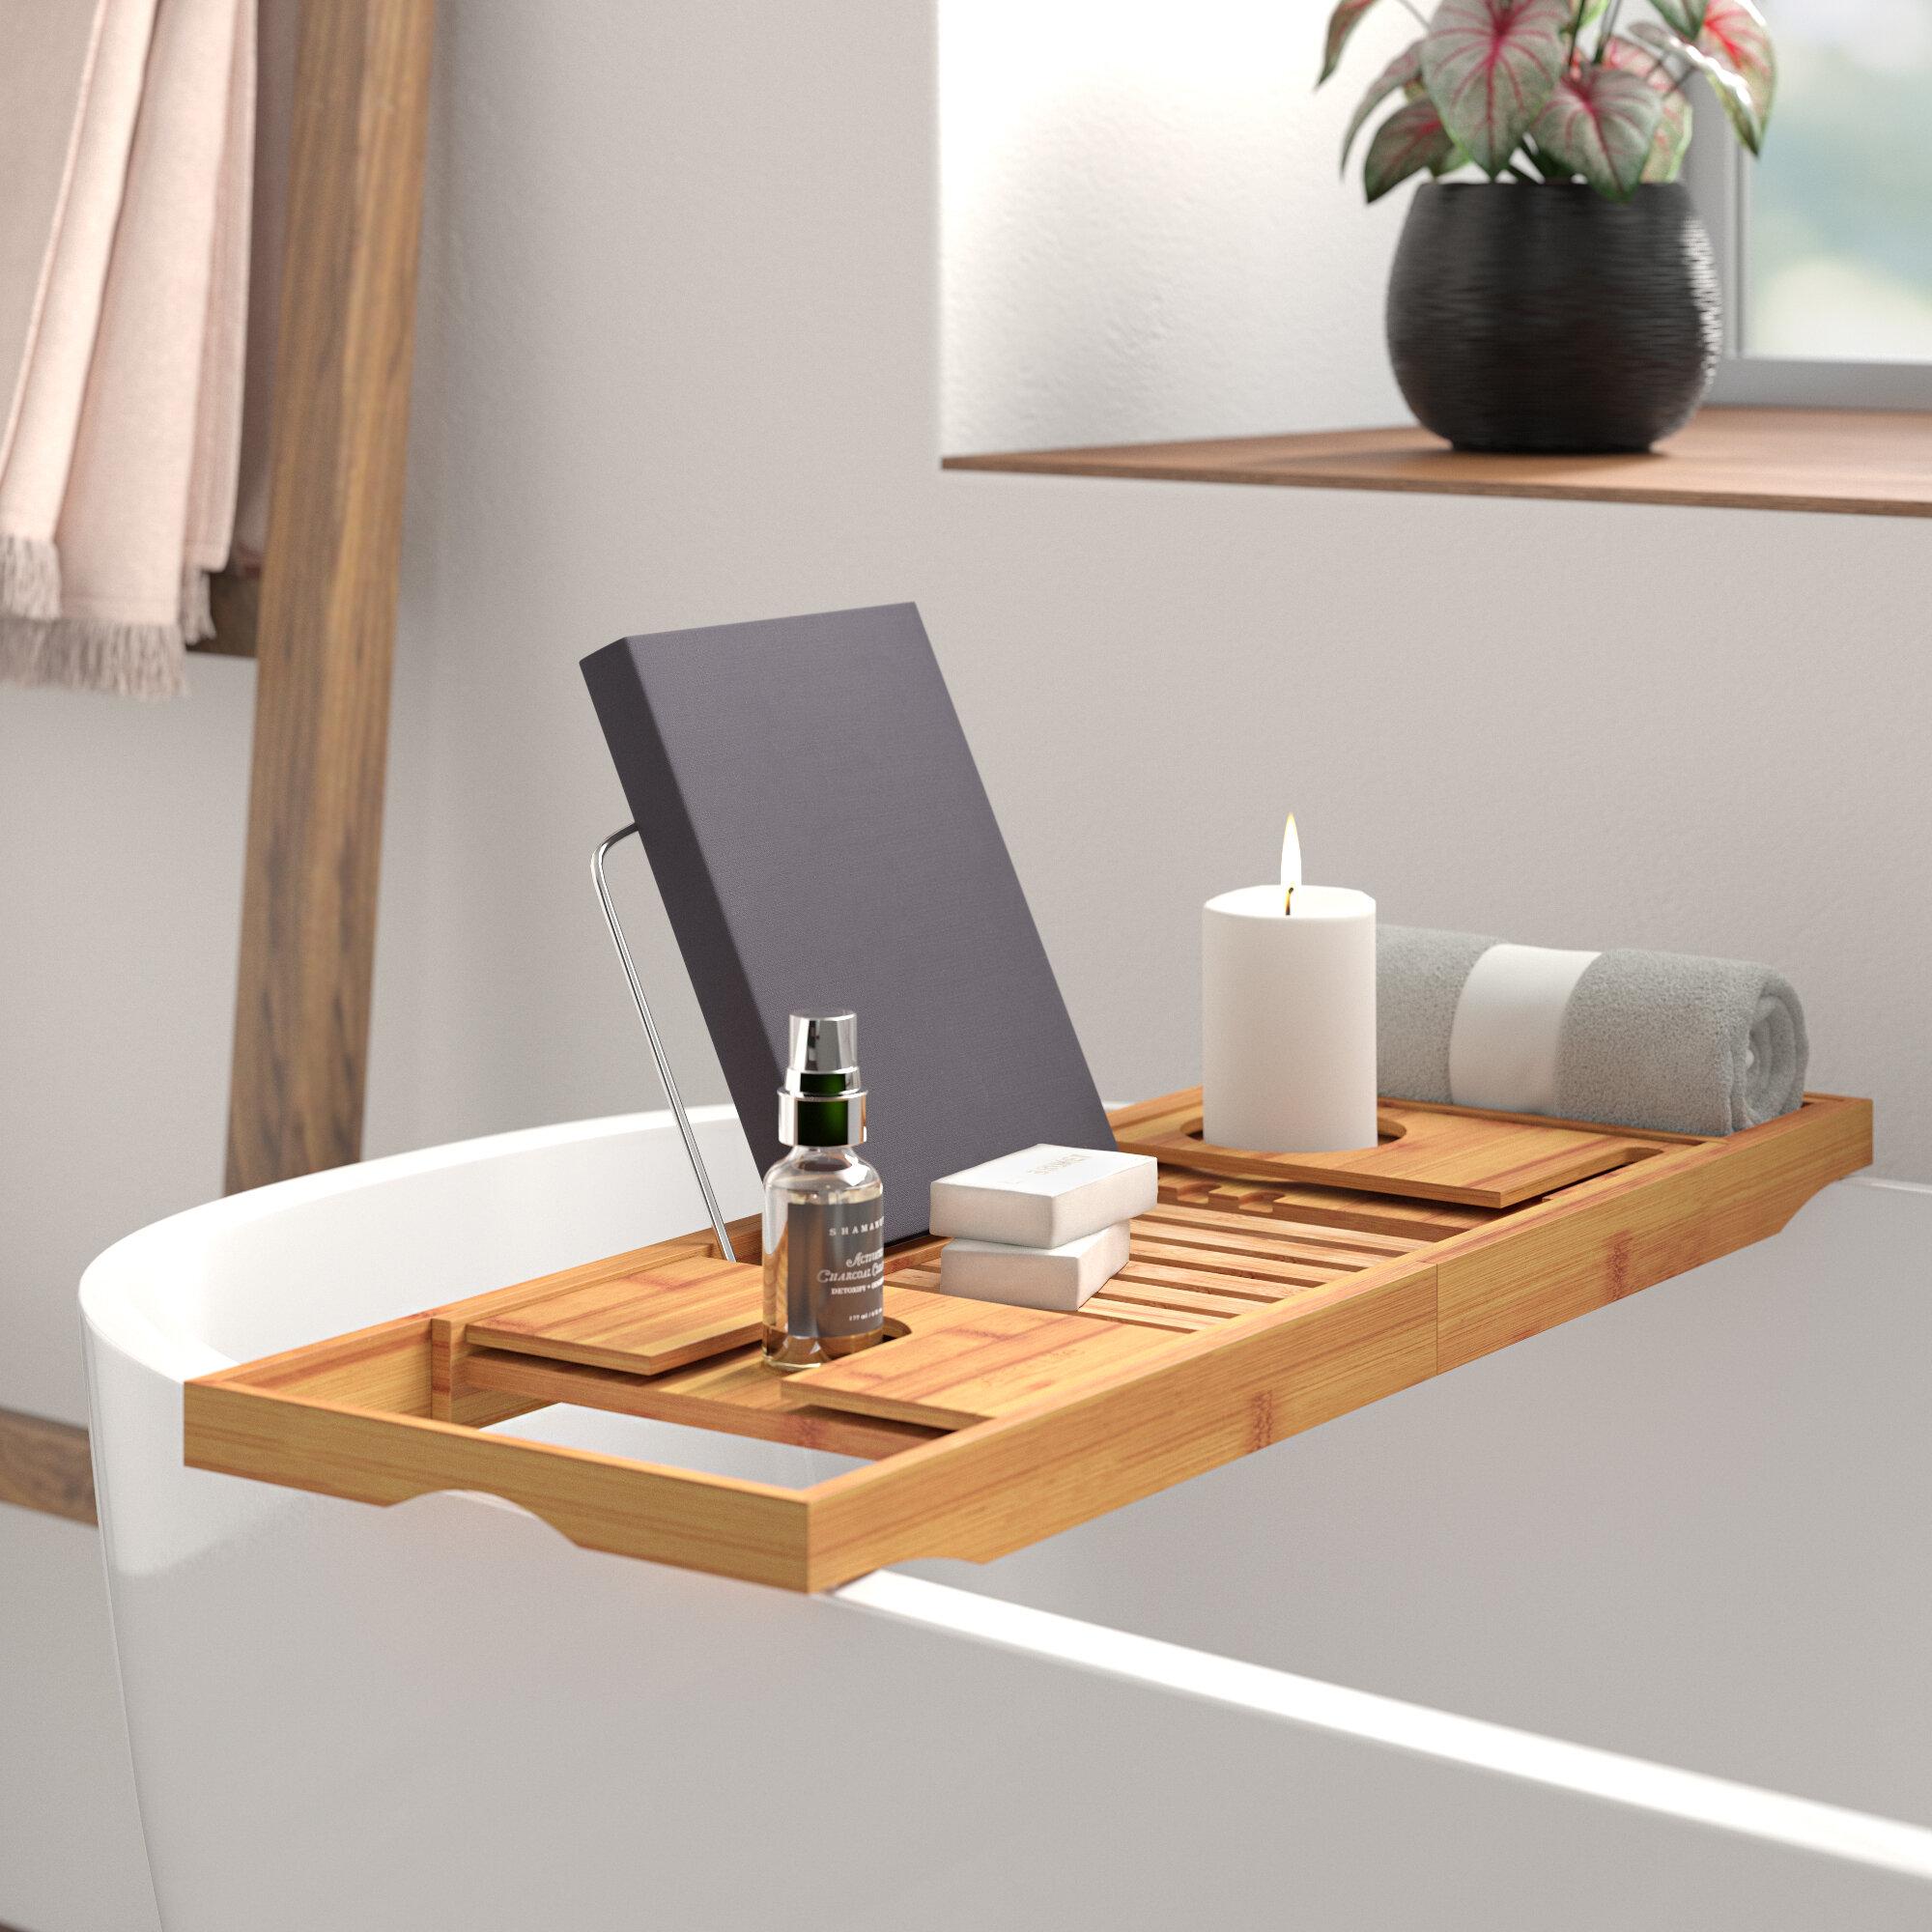 Ebern Designs Bellinger Bamboo Bathtub Caddy Tray Reviews Wayfair